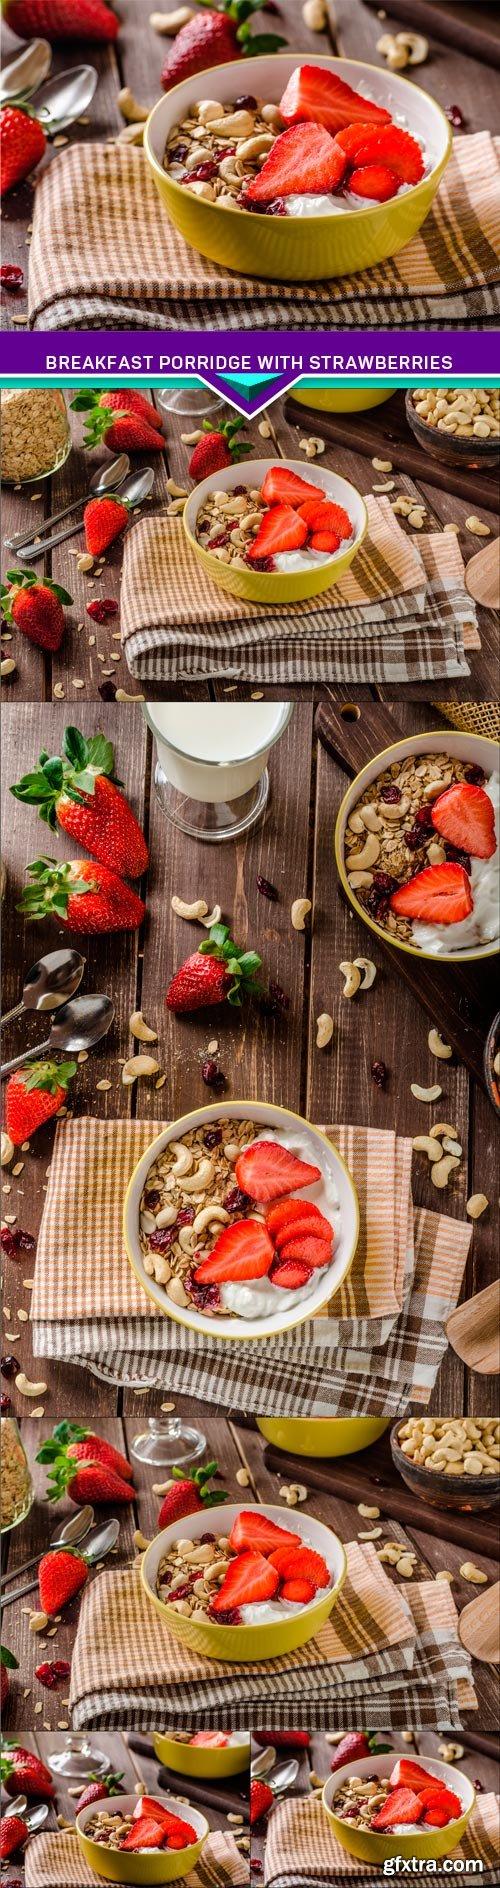 Breakfast porridge with strawberries 5x JPEG